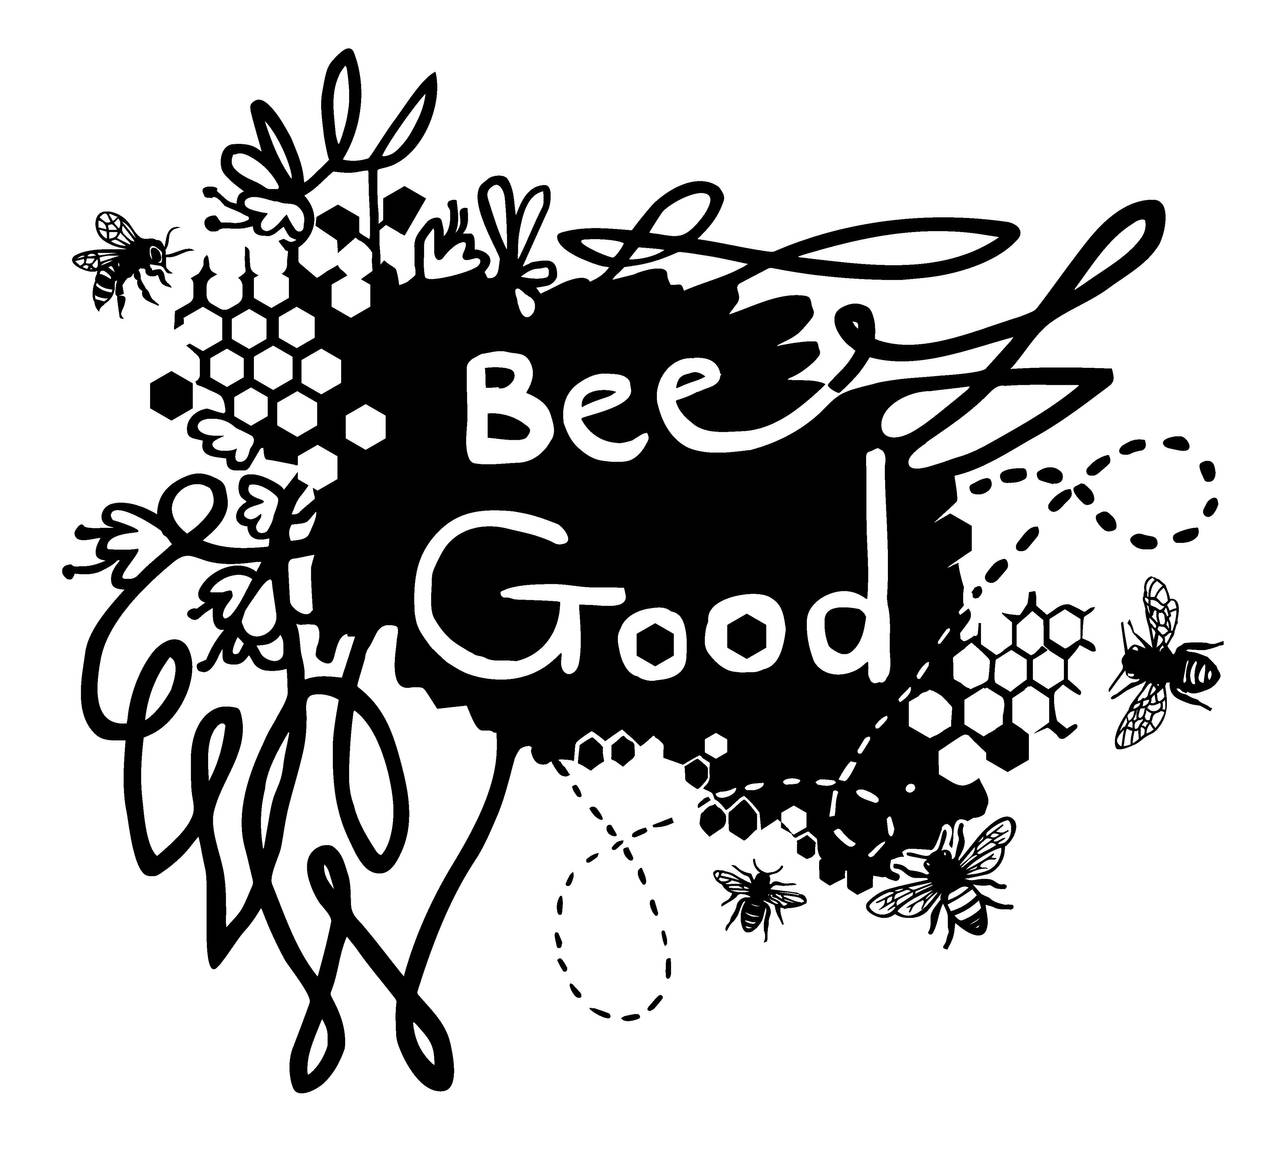 bee good.jpg